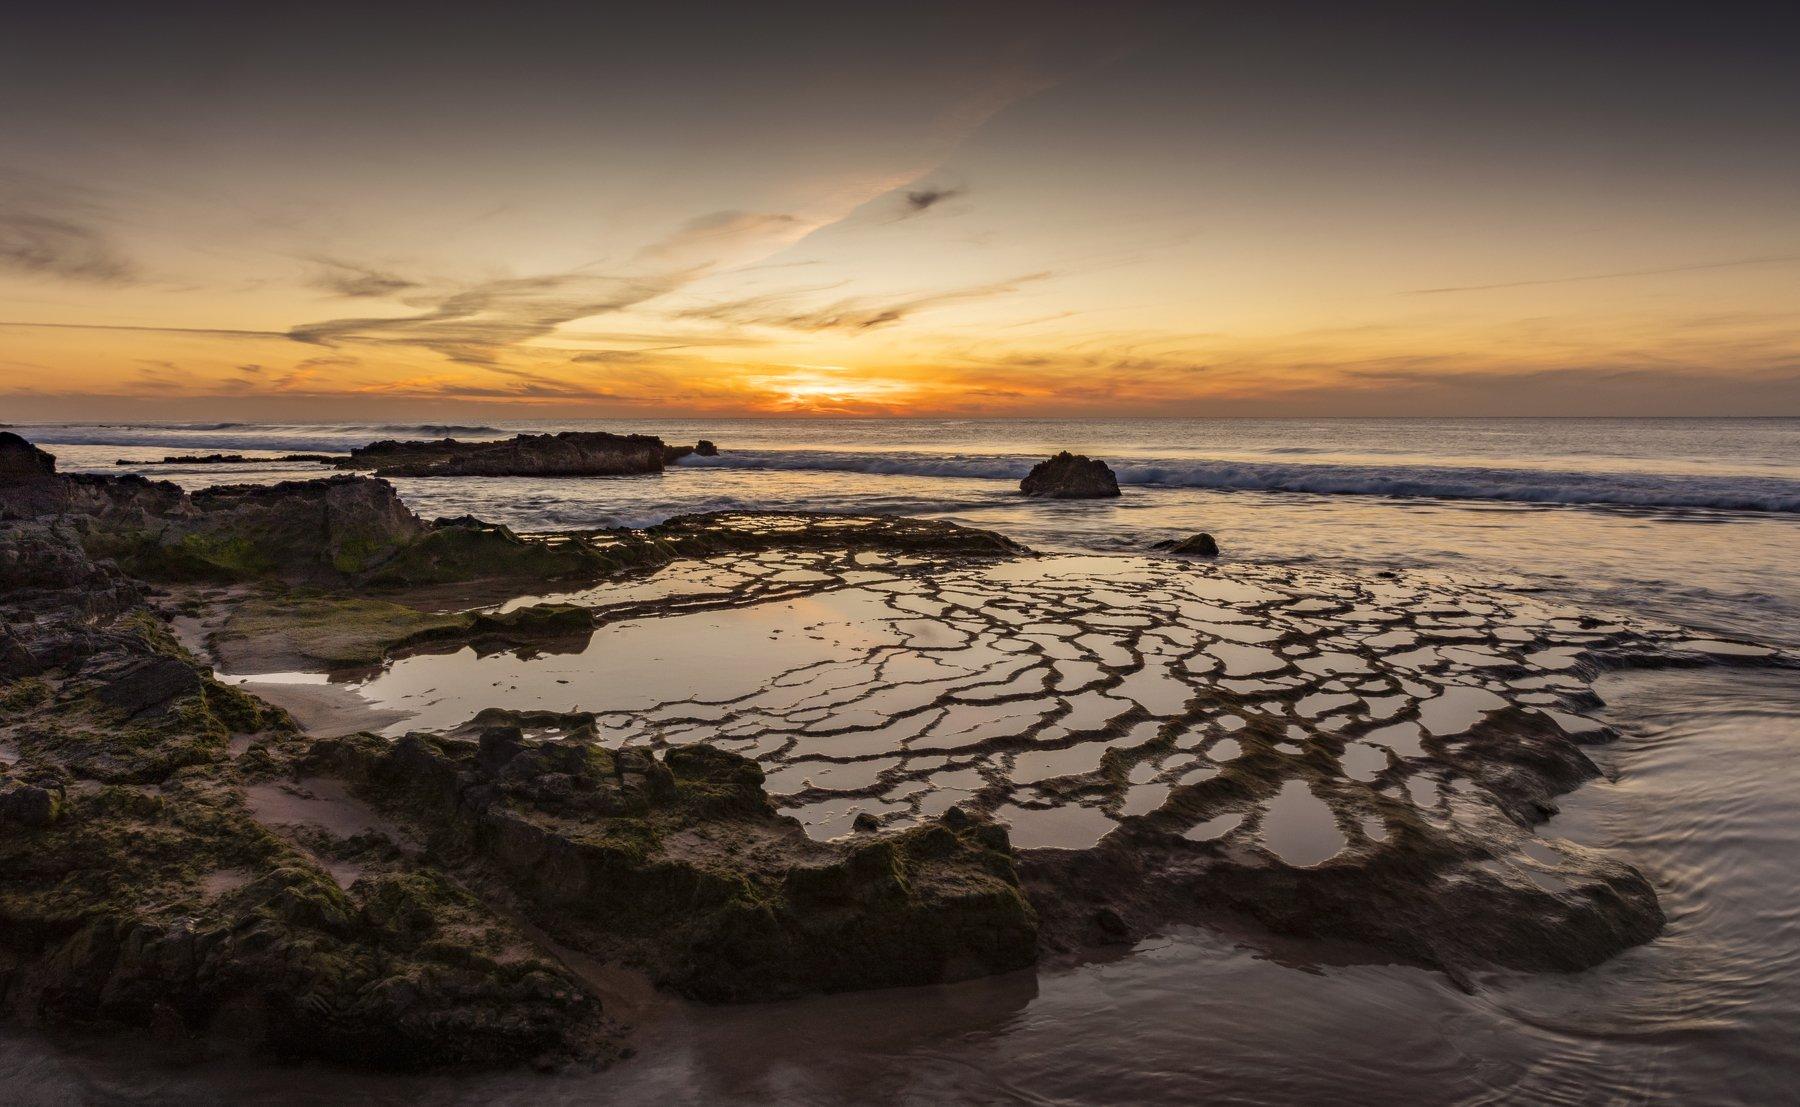 океан, закат, пляж, Alexandr Bezmolitvenny